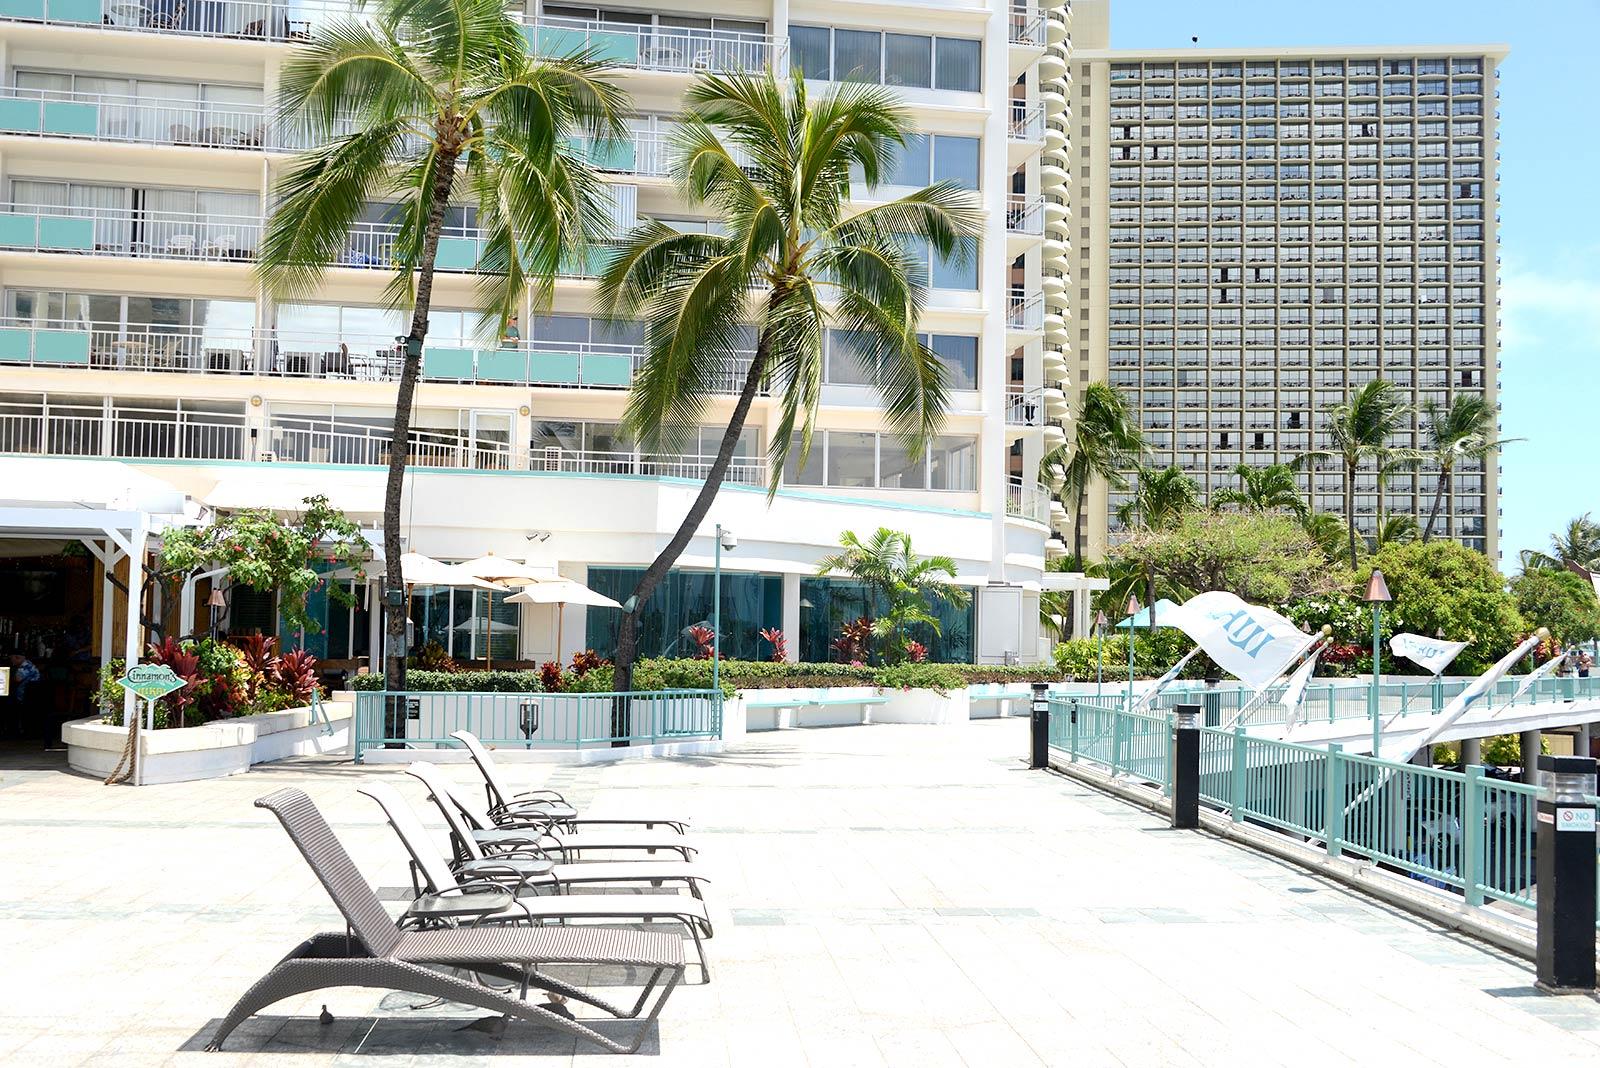 shell-vacations-hawaii-shell-owners-club-hawaii-19